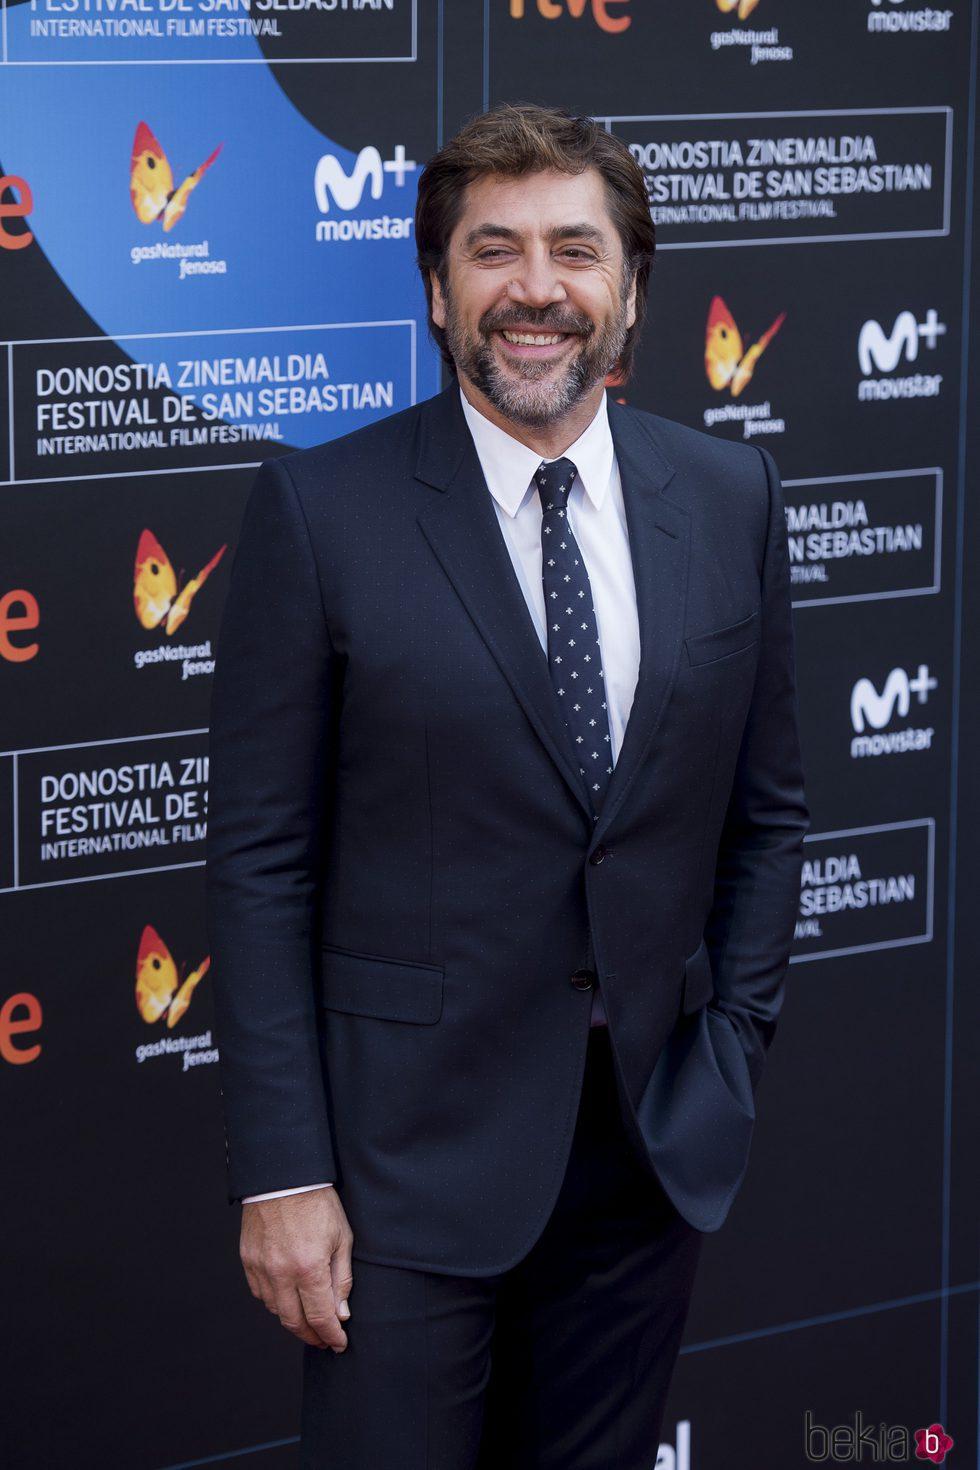 Javier Bardem en la clausura del Festival de San Sebastián 2017